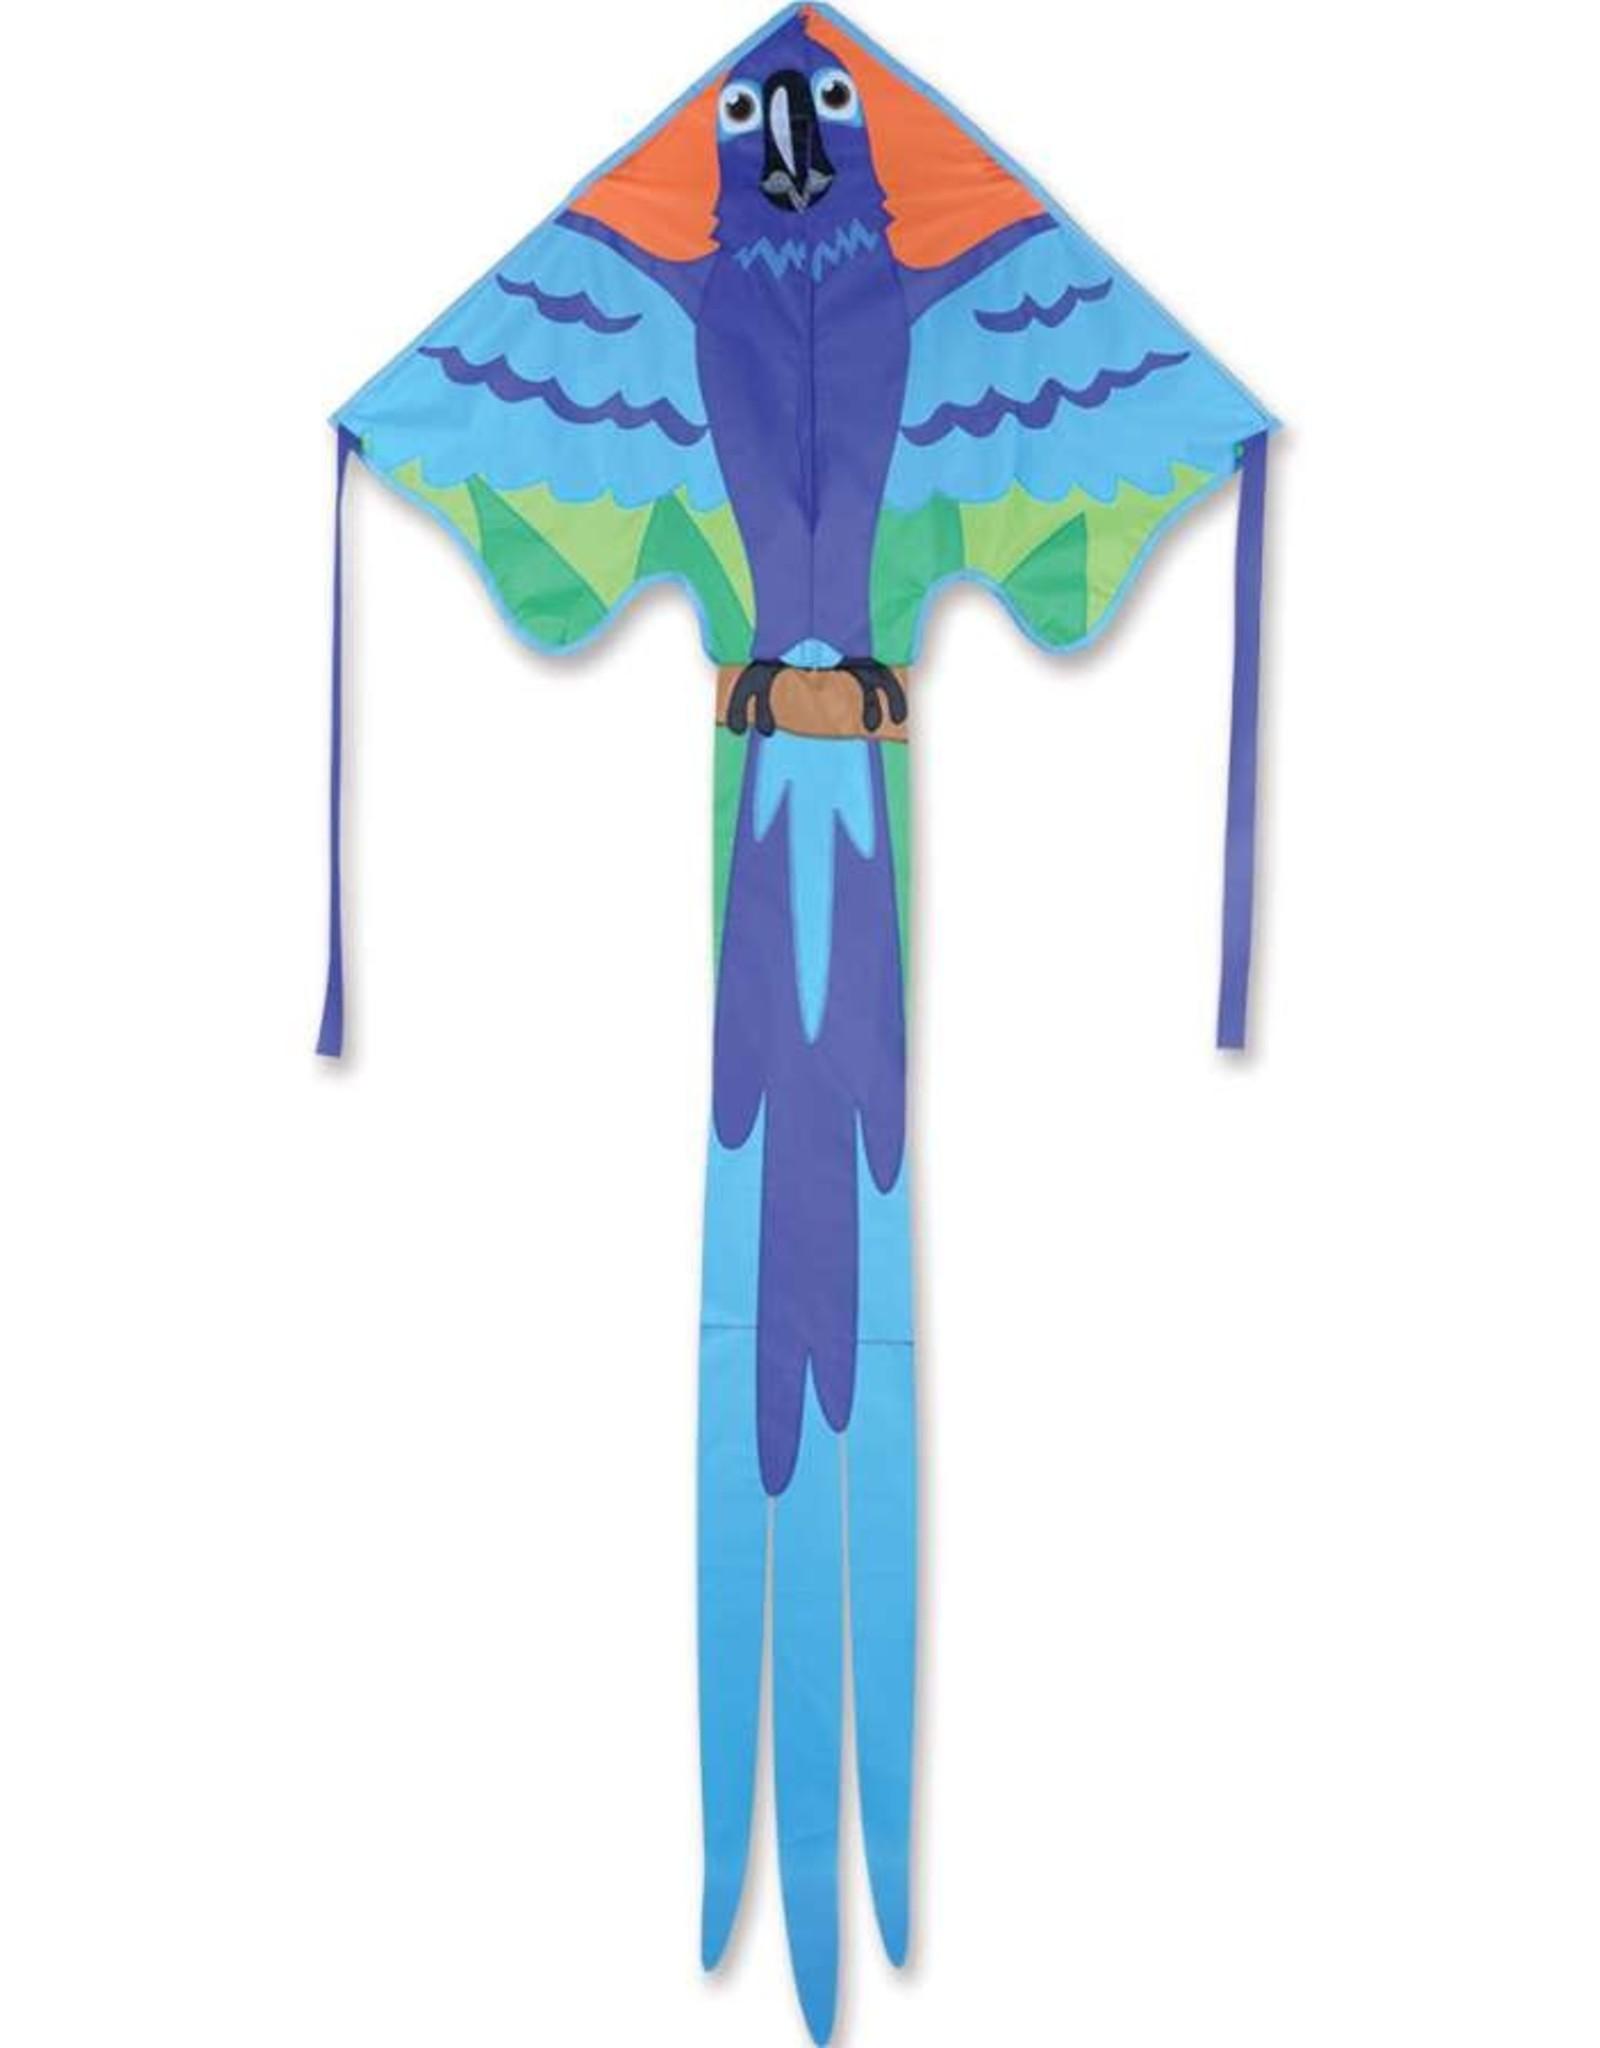 Premier Kites Large Easy Flyer Kite - Blue Macaw